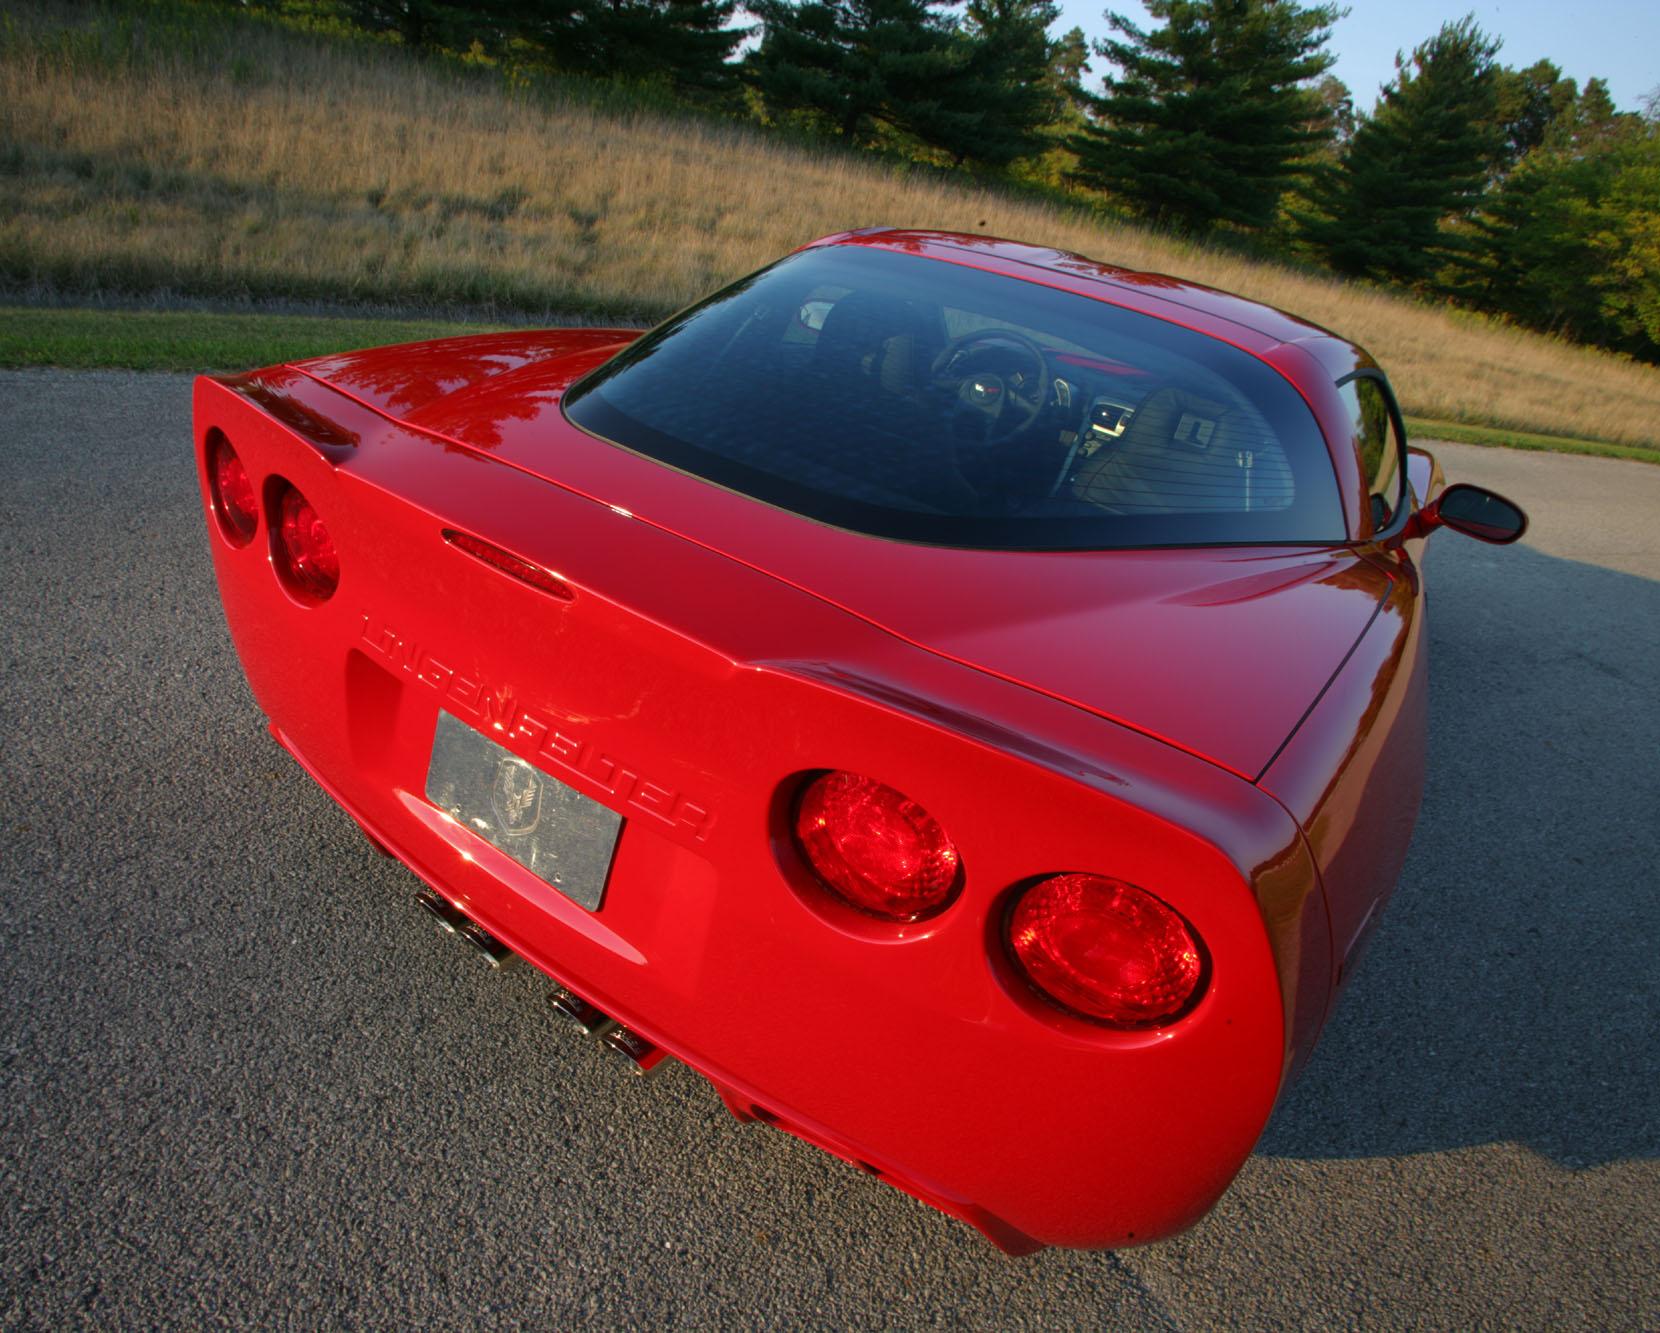 poglej temo lingenfelter corvette c6 twin turbo. Black Bedroom Furniture Sets. Home Design Ideas